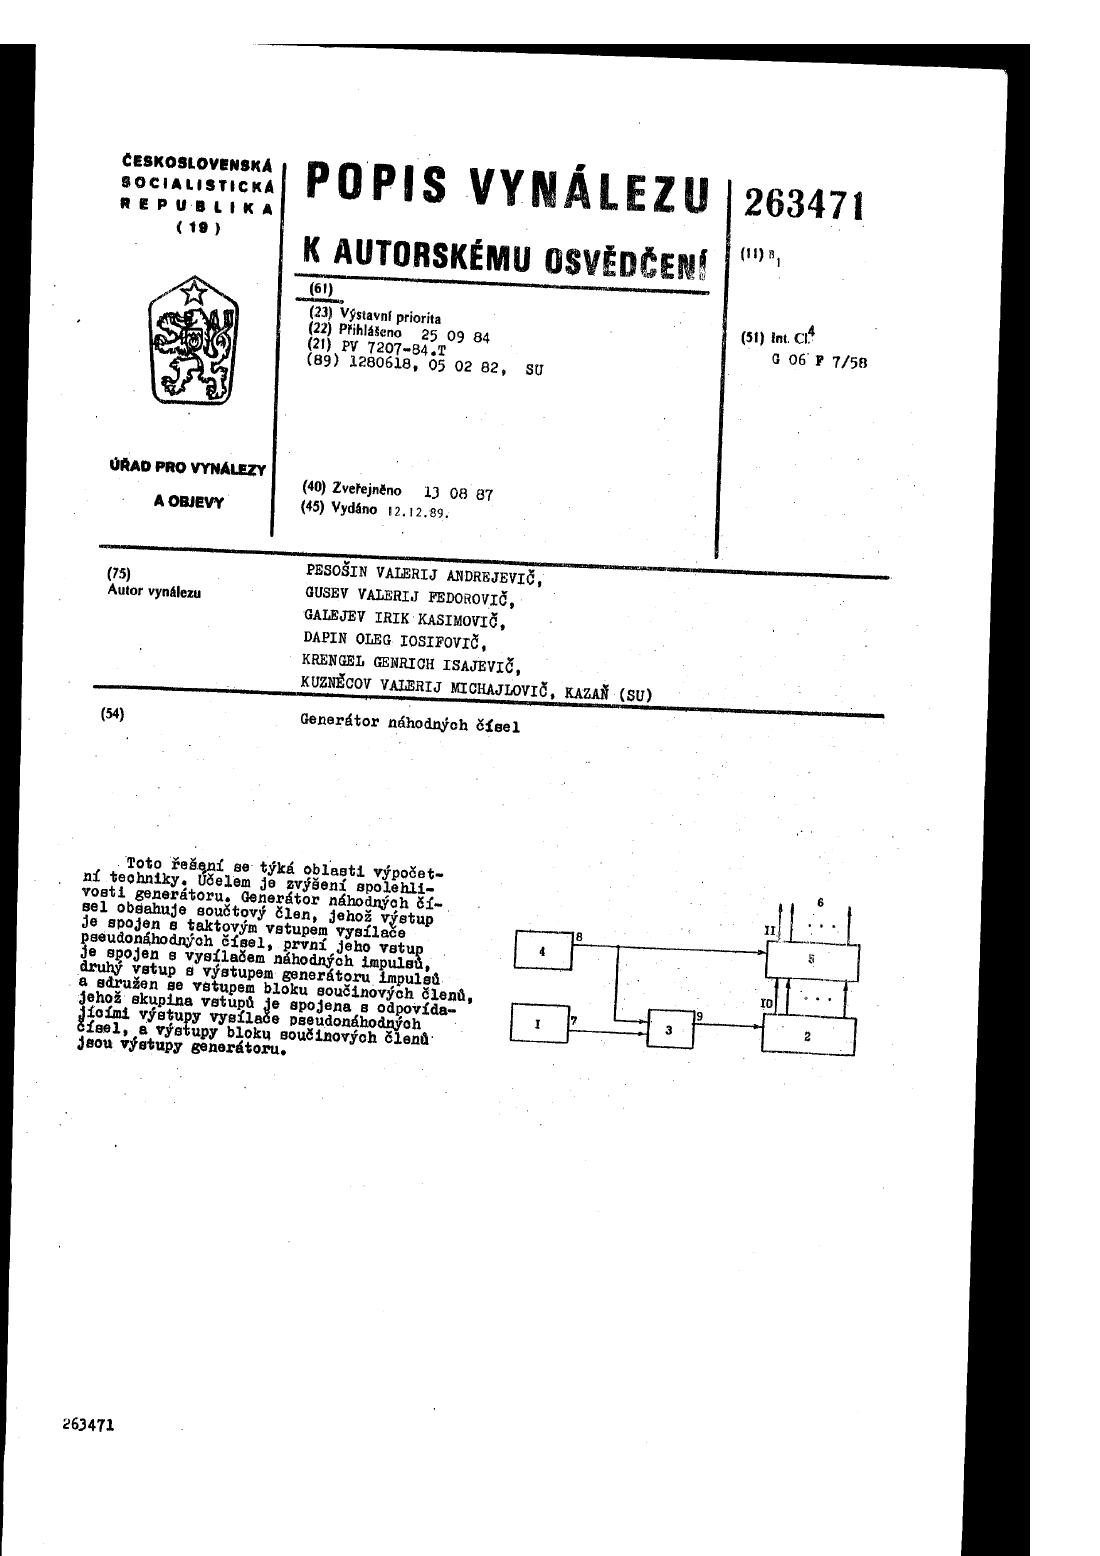 Loto Lotrie nhodn genertor (Slovakia)